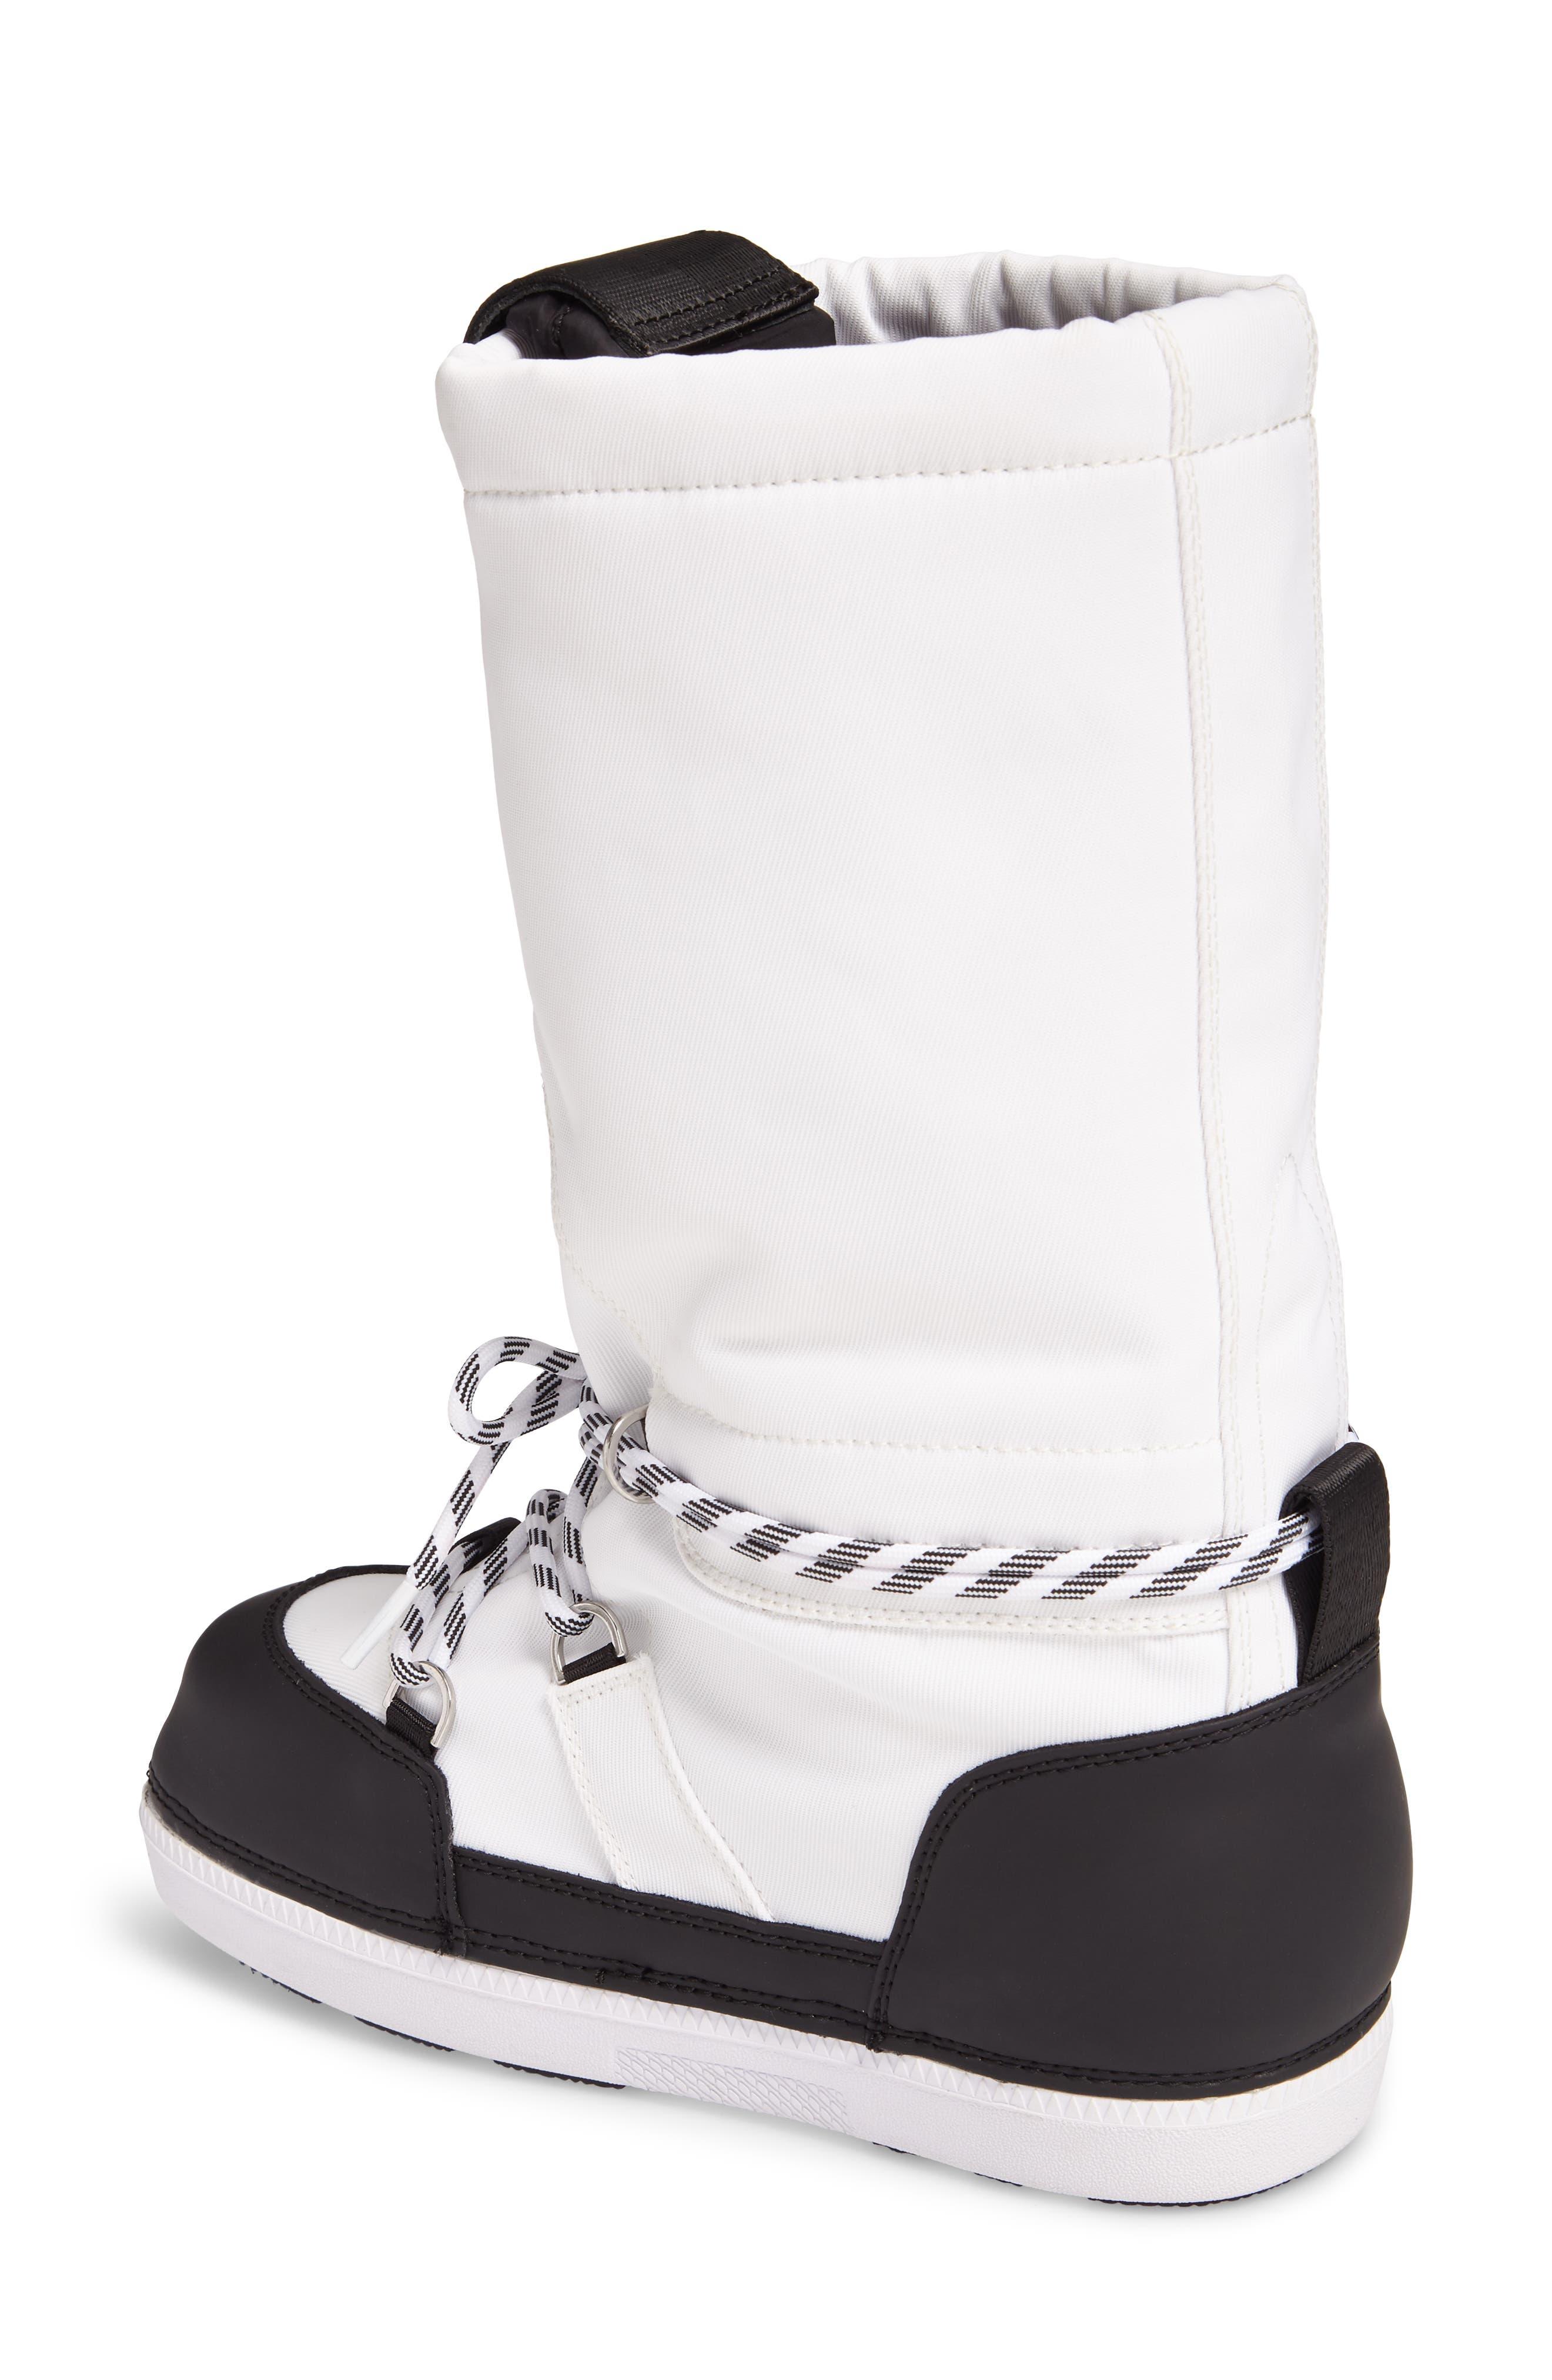 Alternate Image 3  - Hunter Original Waterproof Snow Boot (Women)